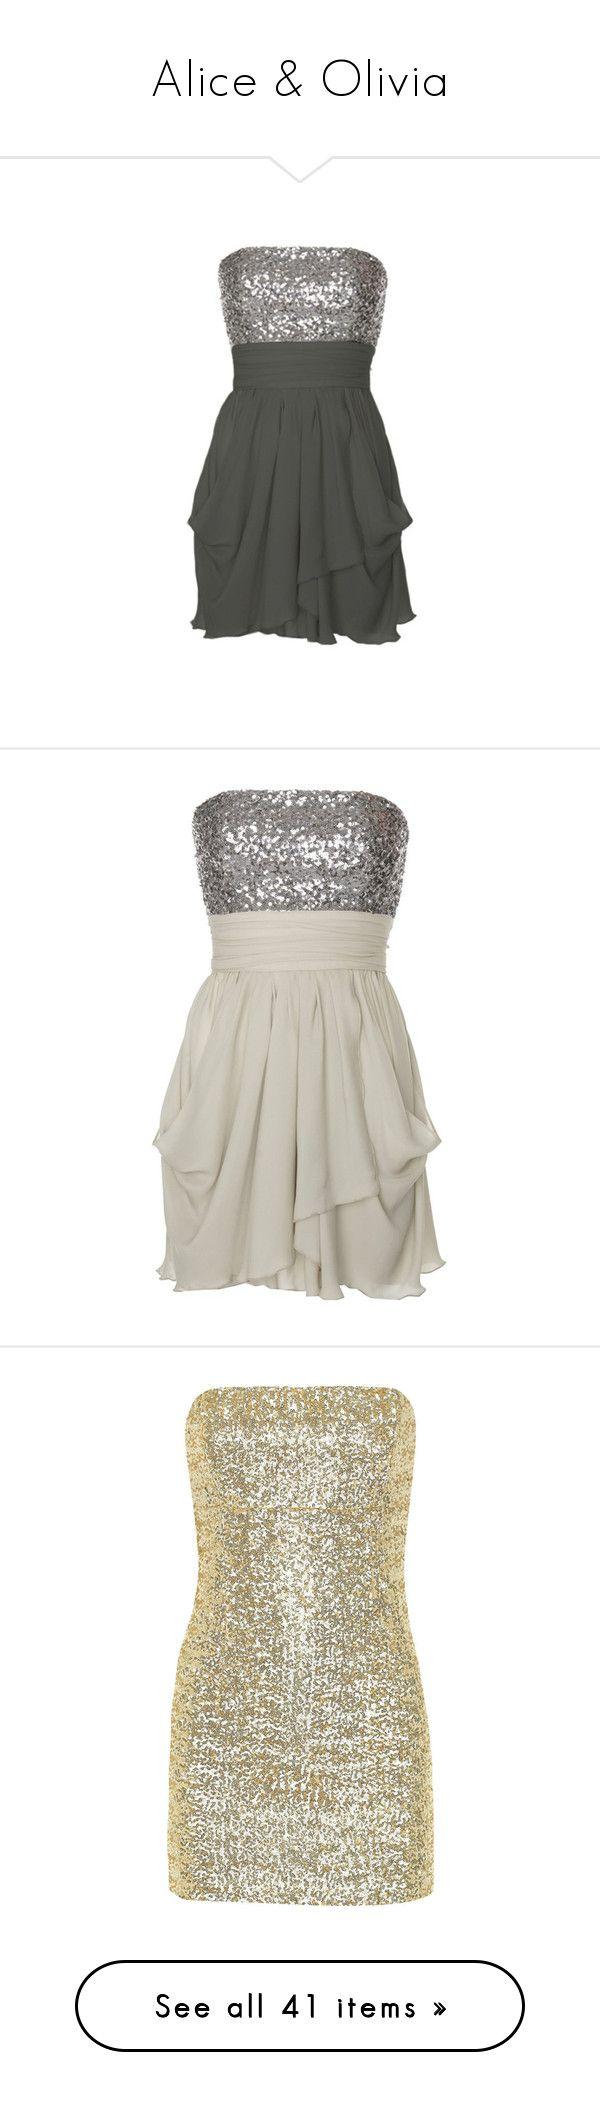 """Alice & Olivia"" by enchantedxox ❤ liked on Polyvore featuring dresses, vestidos, short dresses, vestiti, women, sequin dress, sexy sequin dresses, mini dress, short sequin dress and short strapless cocktail dress"